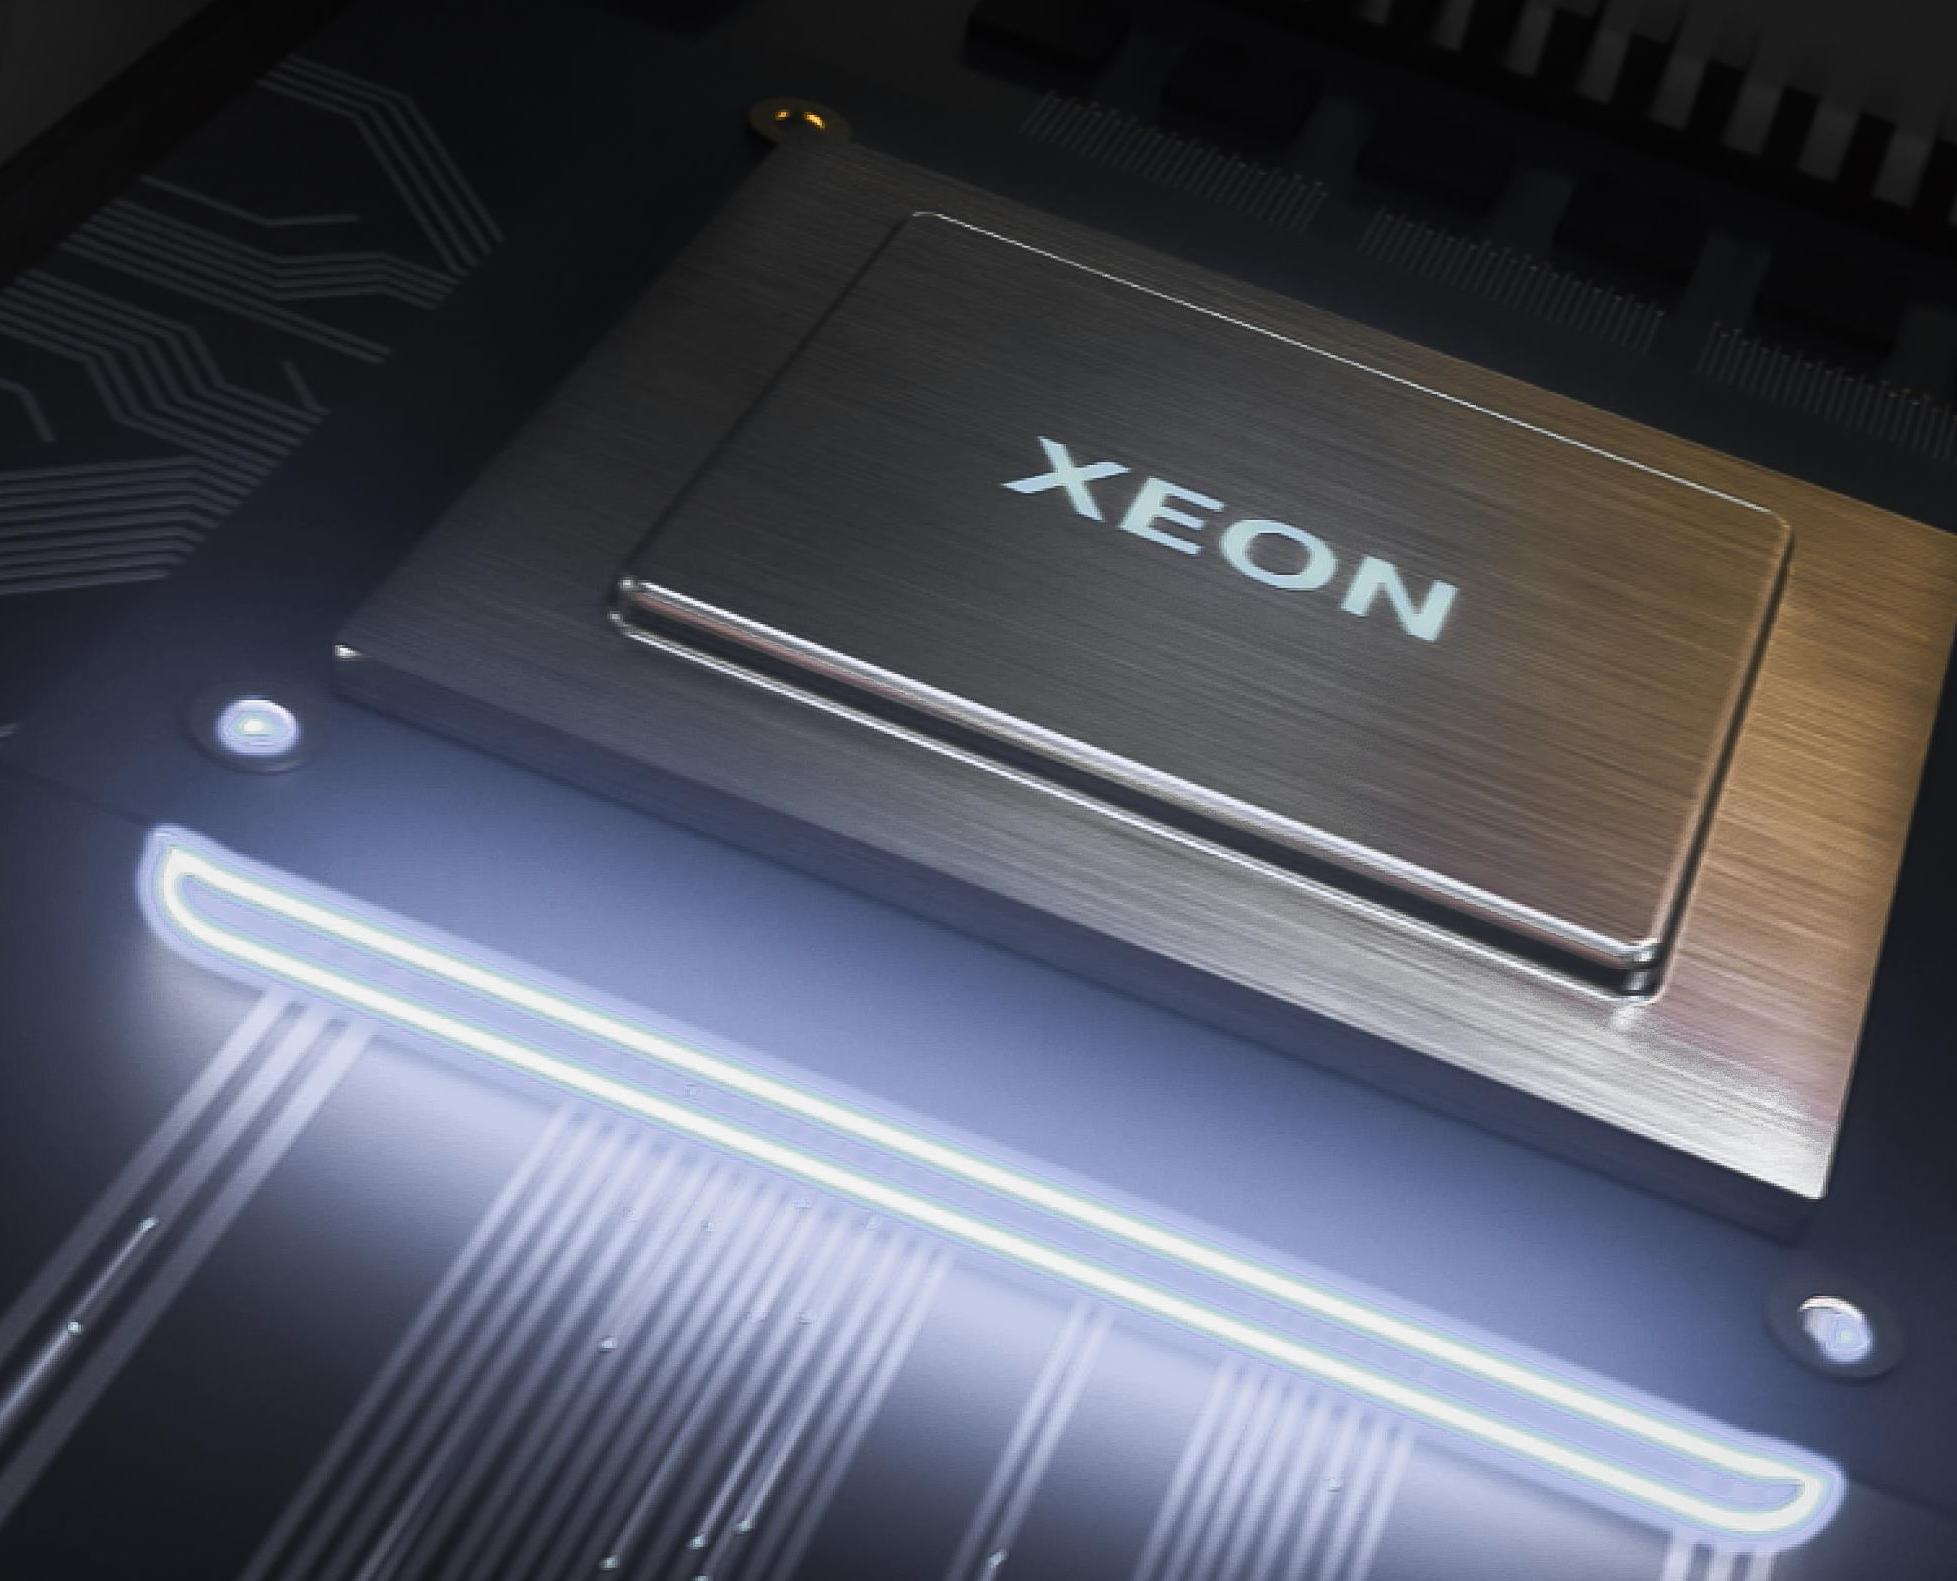 Gambar dari Intel's 4th Generation Xeon 'Sapphire Rapids' Processors Telah Muncul